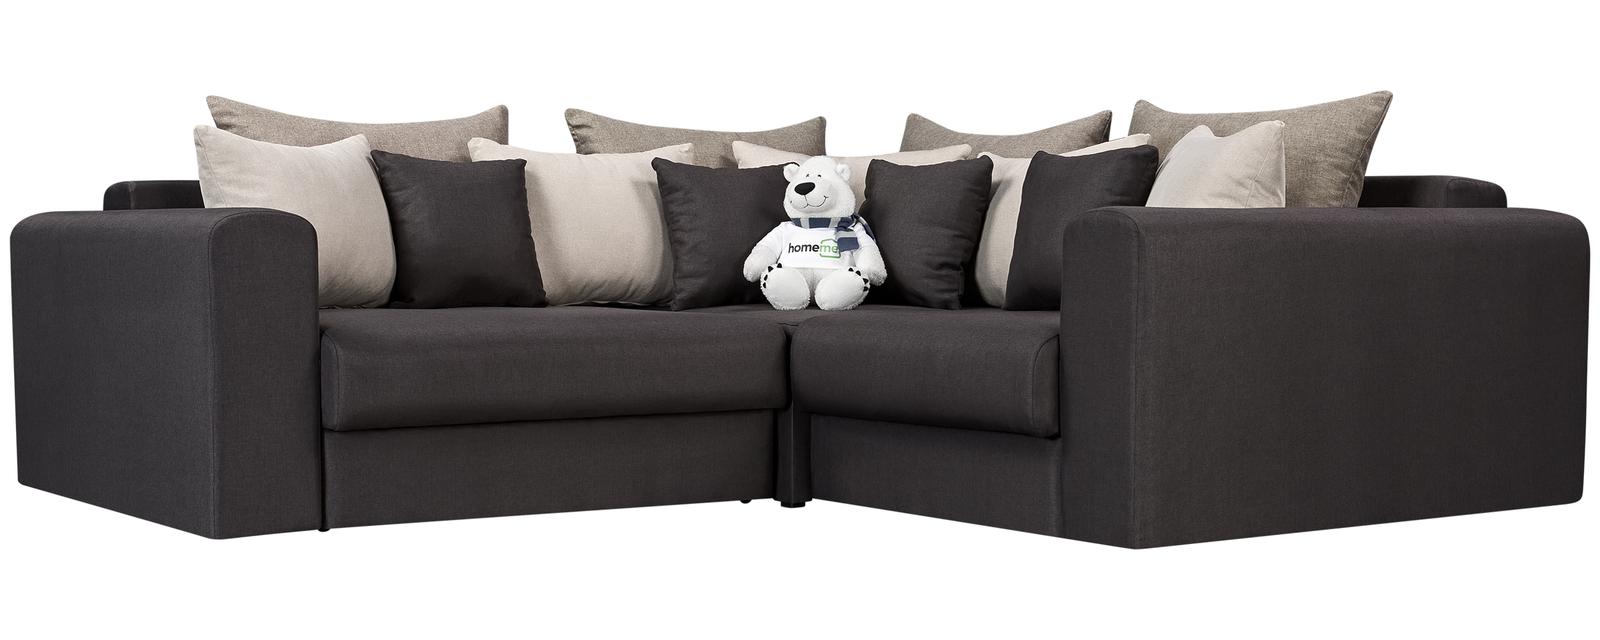 Модульный диван Медисон Вариант №3 Kiton тёмно-серый (Рогожка)